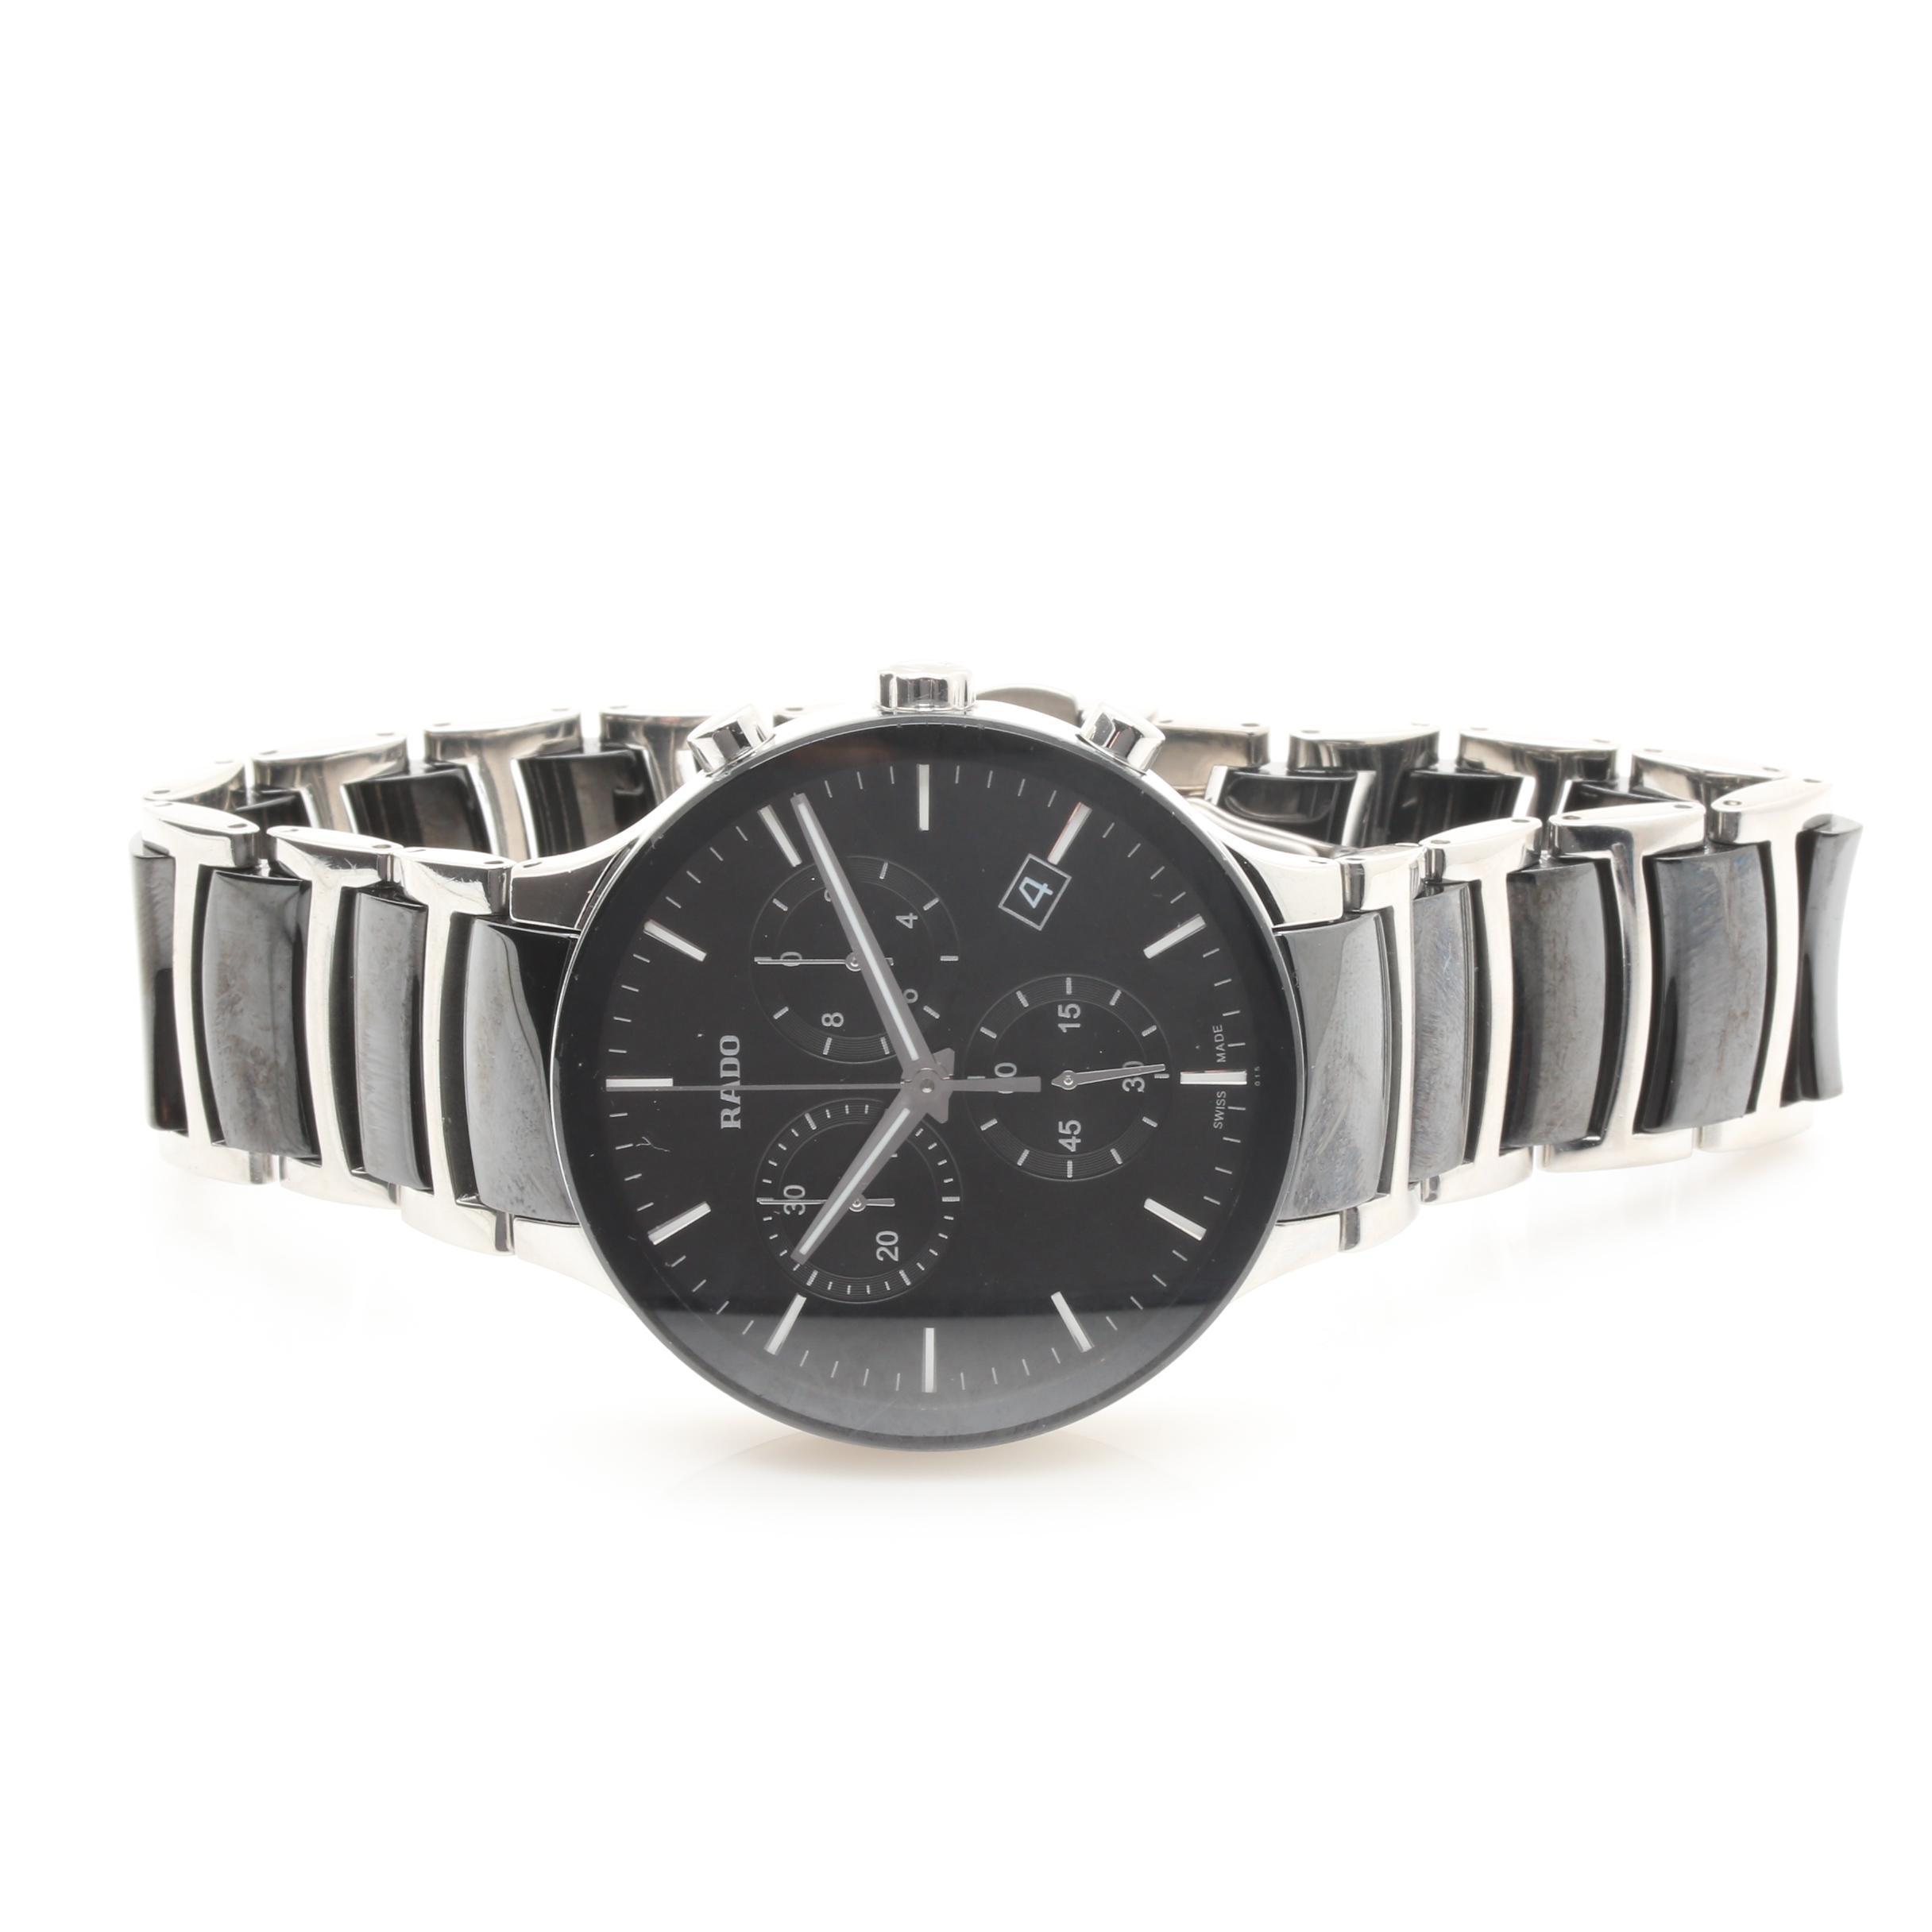 Rado Chronograph Wristwatch